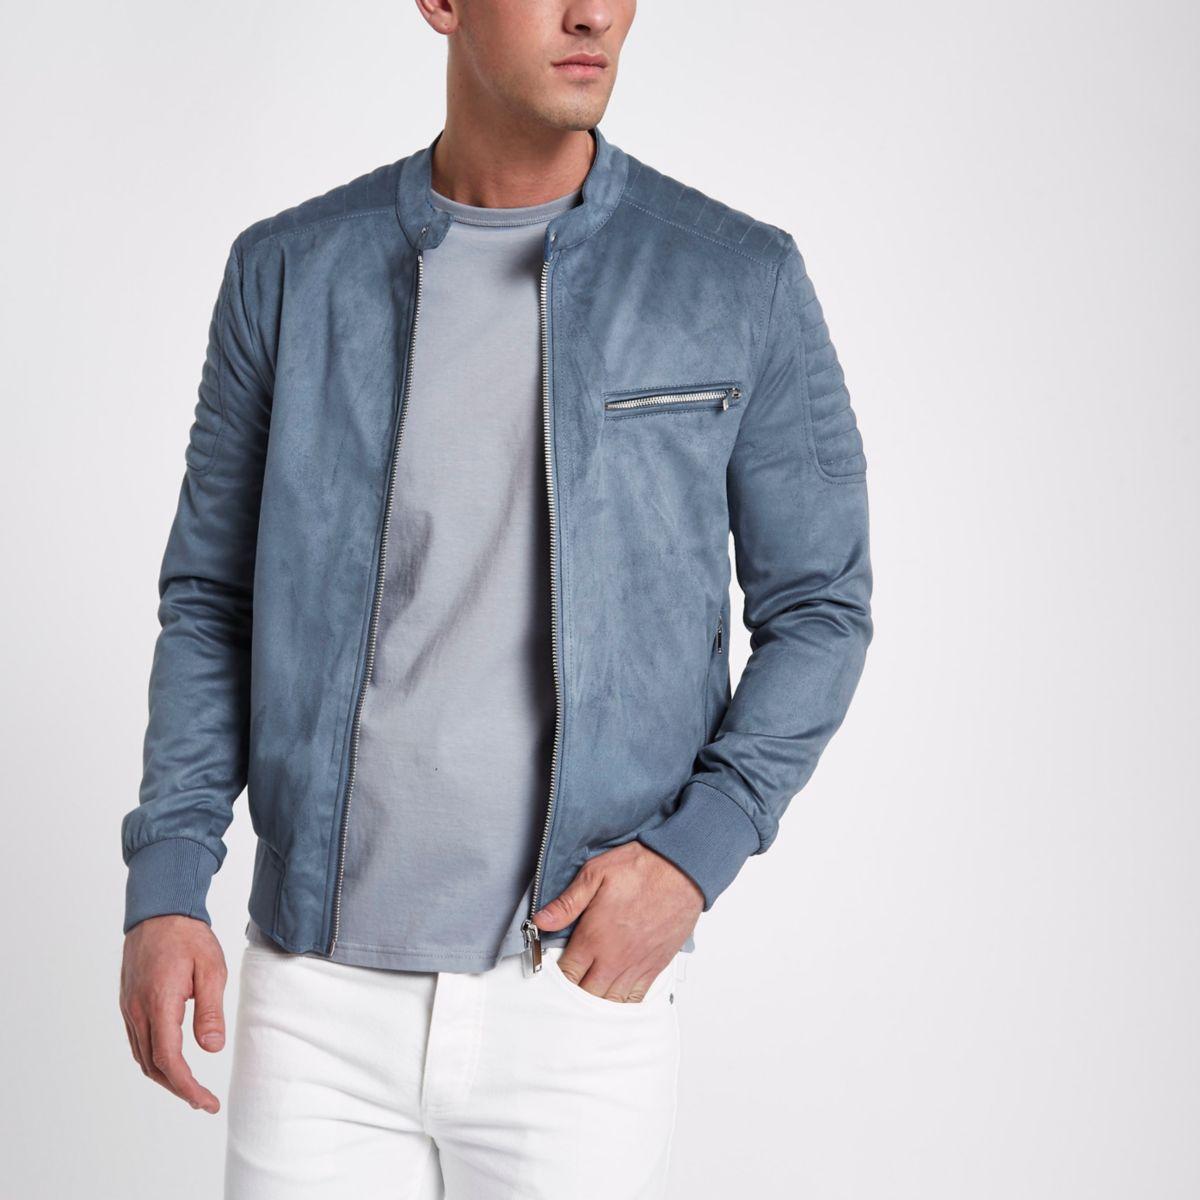 Blaue Jacke aus Wildlederimitat mit Racerneck